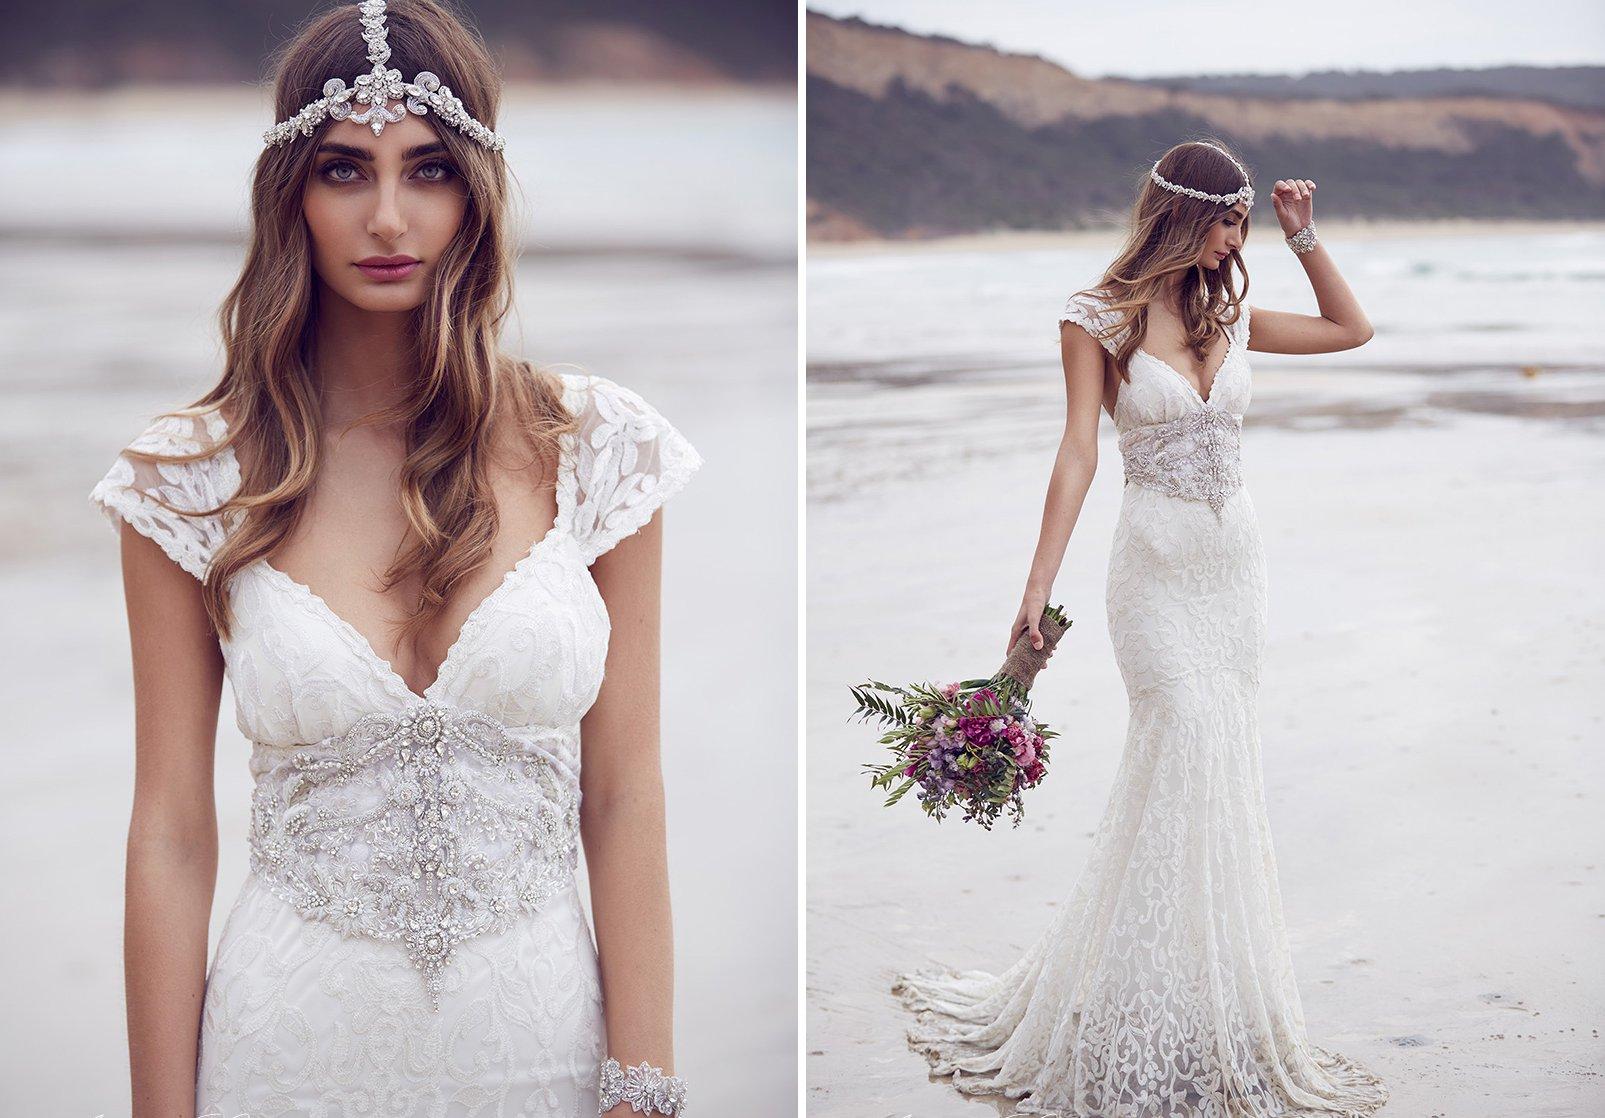 anna campbell die spirit kollektion 2015 35mm wedding photography anna ...